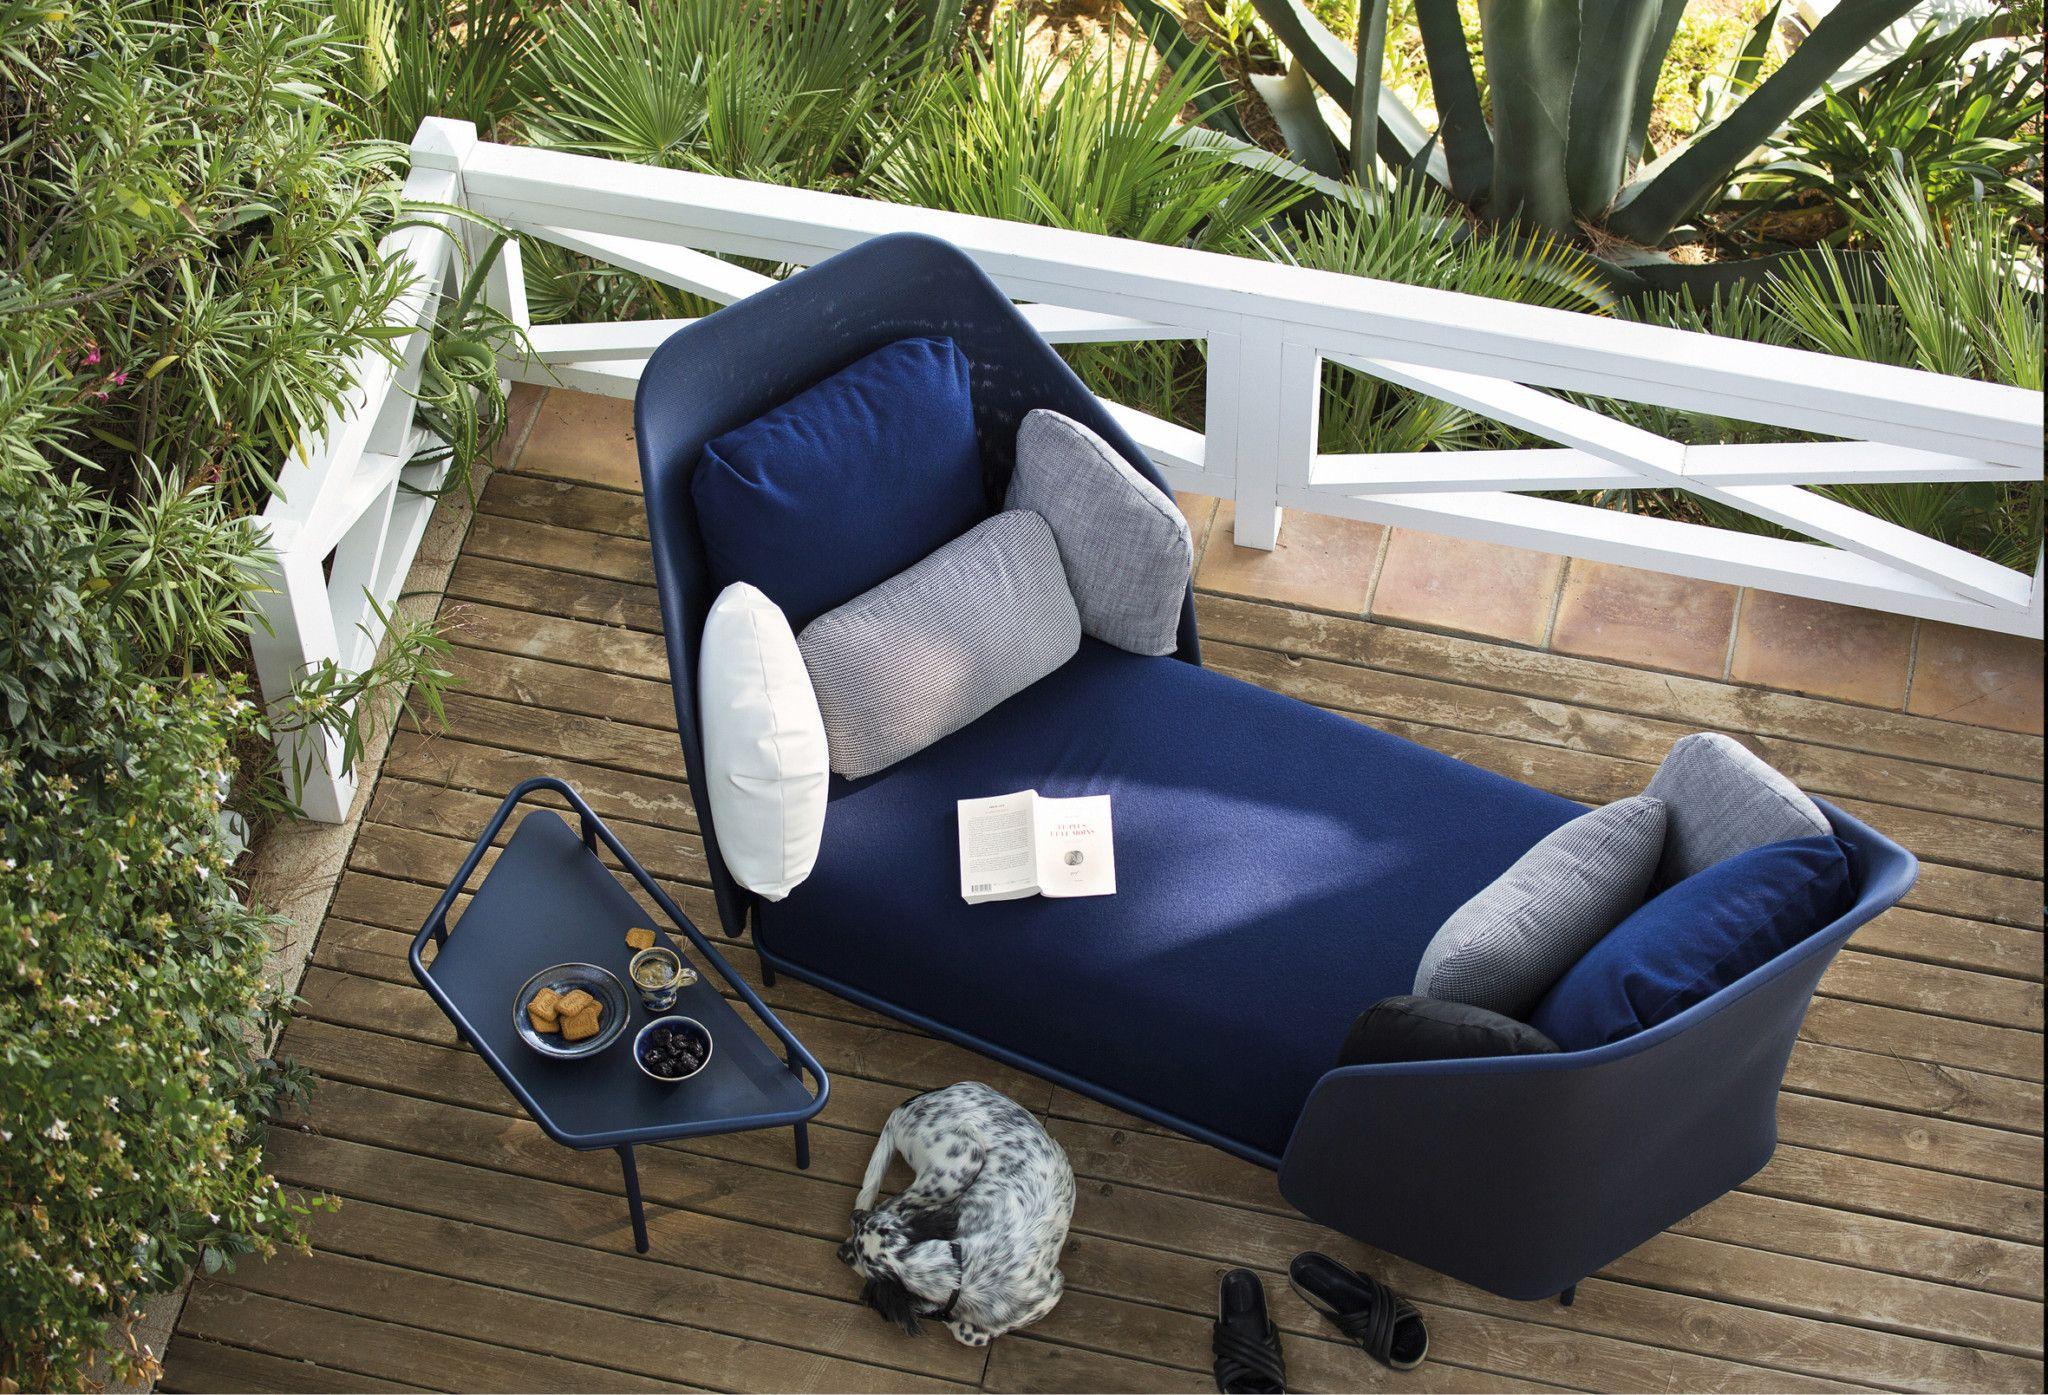 hive ego paris salon de jardin chaise longue jardin mobilier jardin